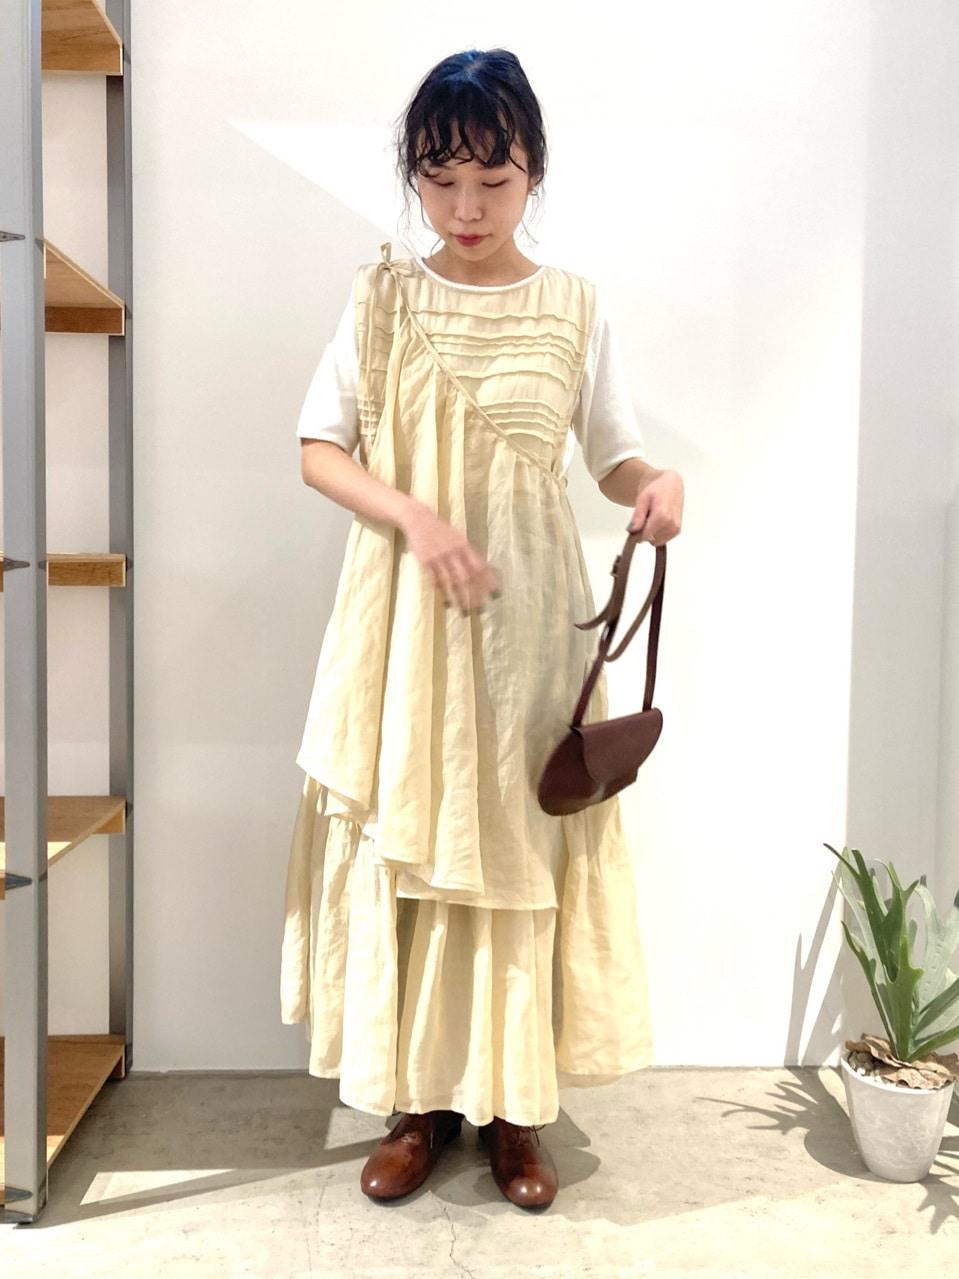 Dot and Stripes CHILD WOMAN 名古屋栄路面 身長:152cm 2021.06.01